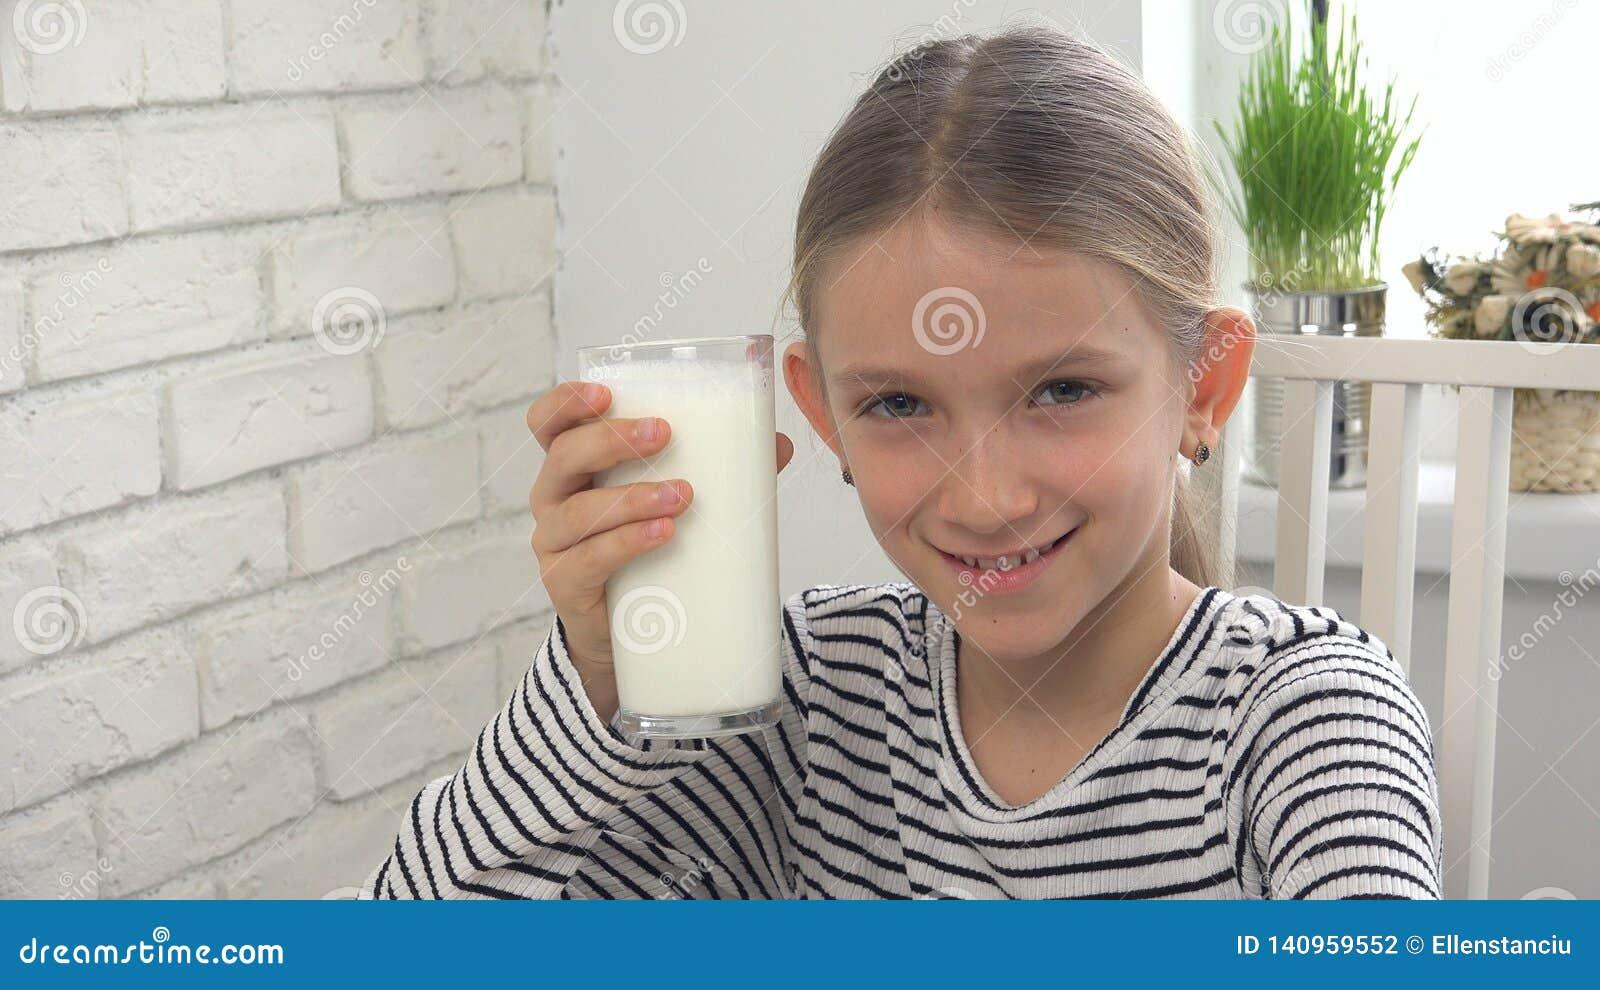 Child Drinking Milk at Breakfast in Kitchen, Girl Tasting Dairy Products